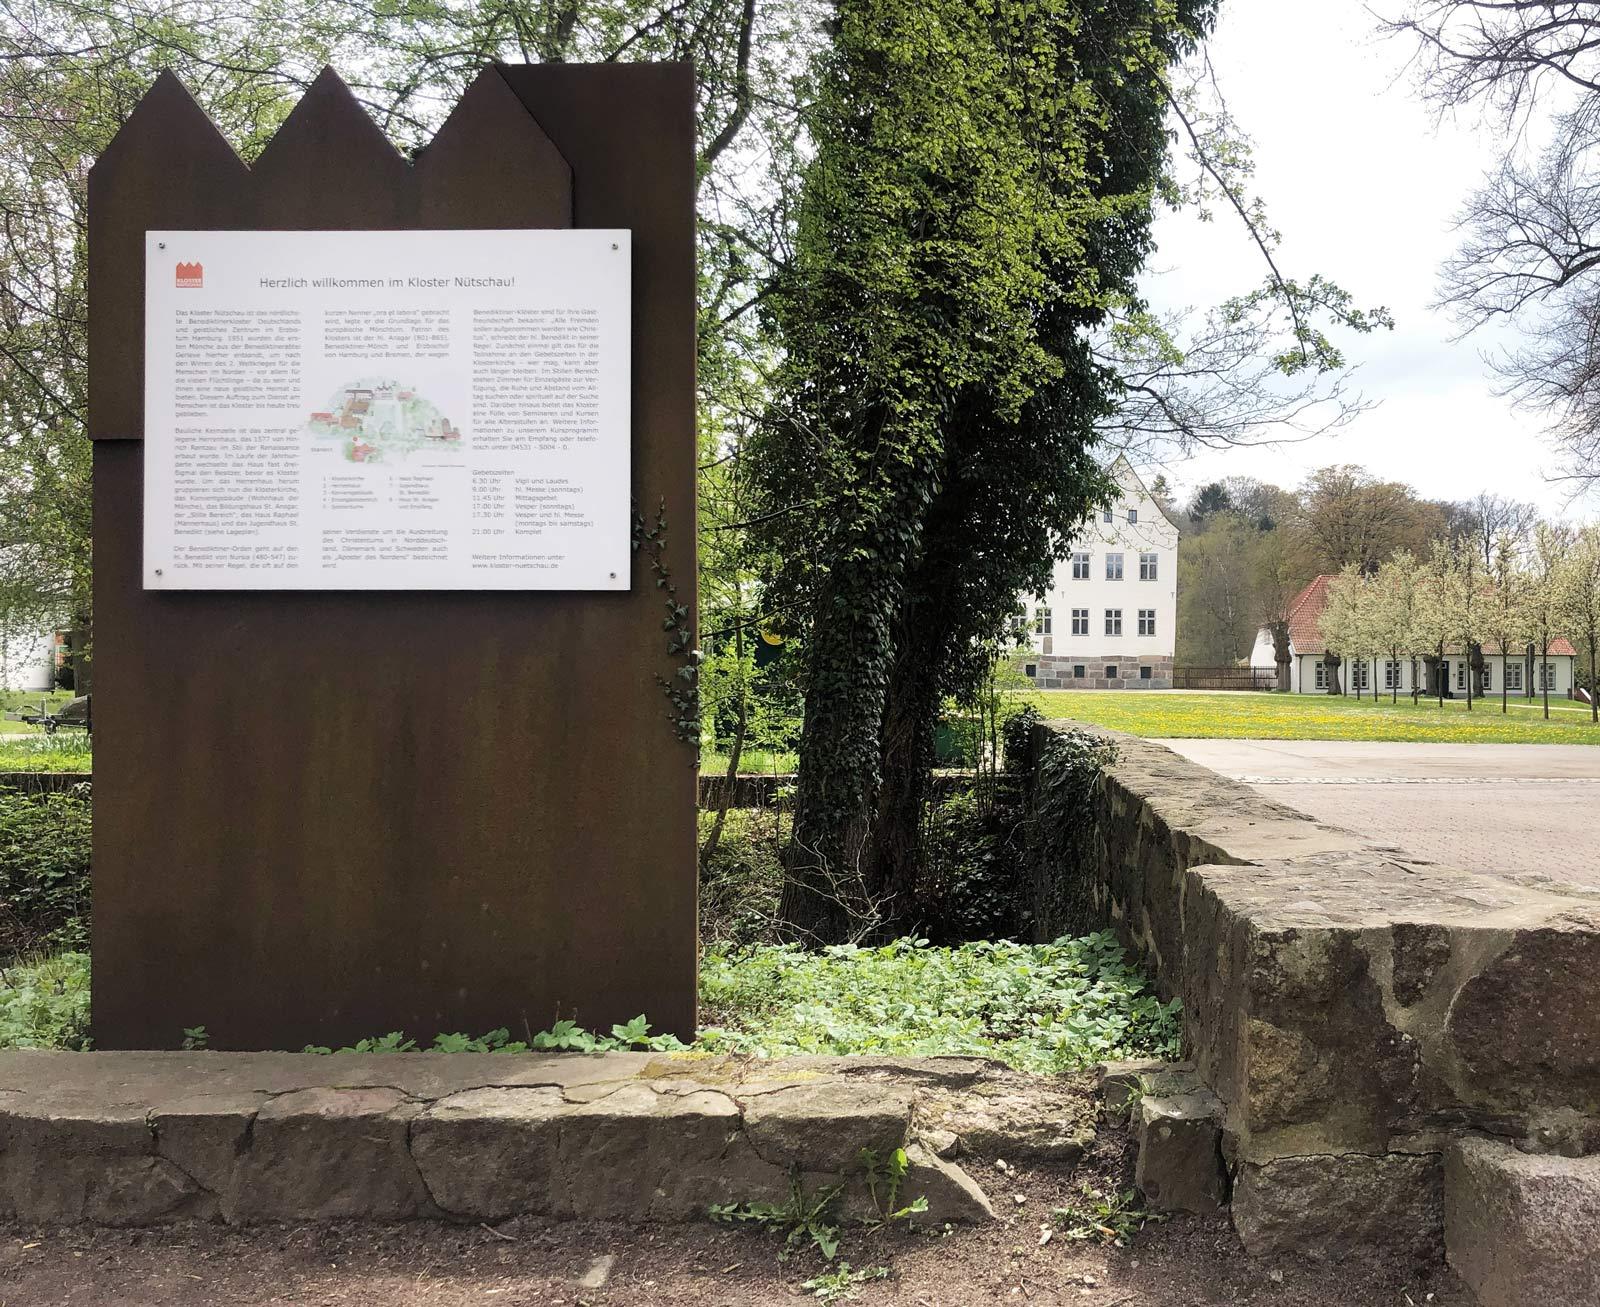 Kloster Nuetschau, Skulptur